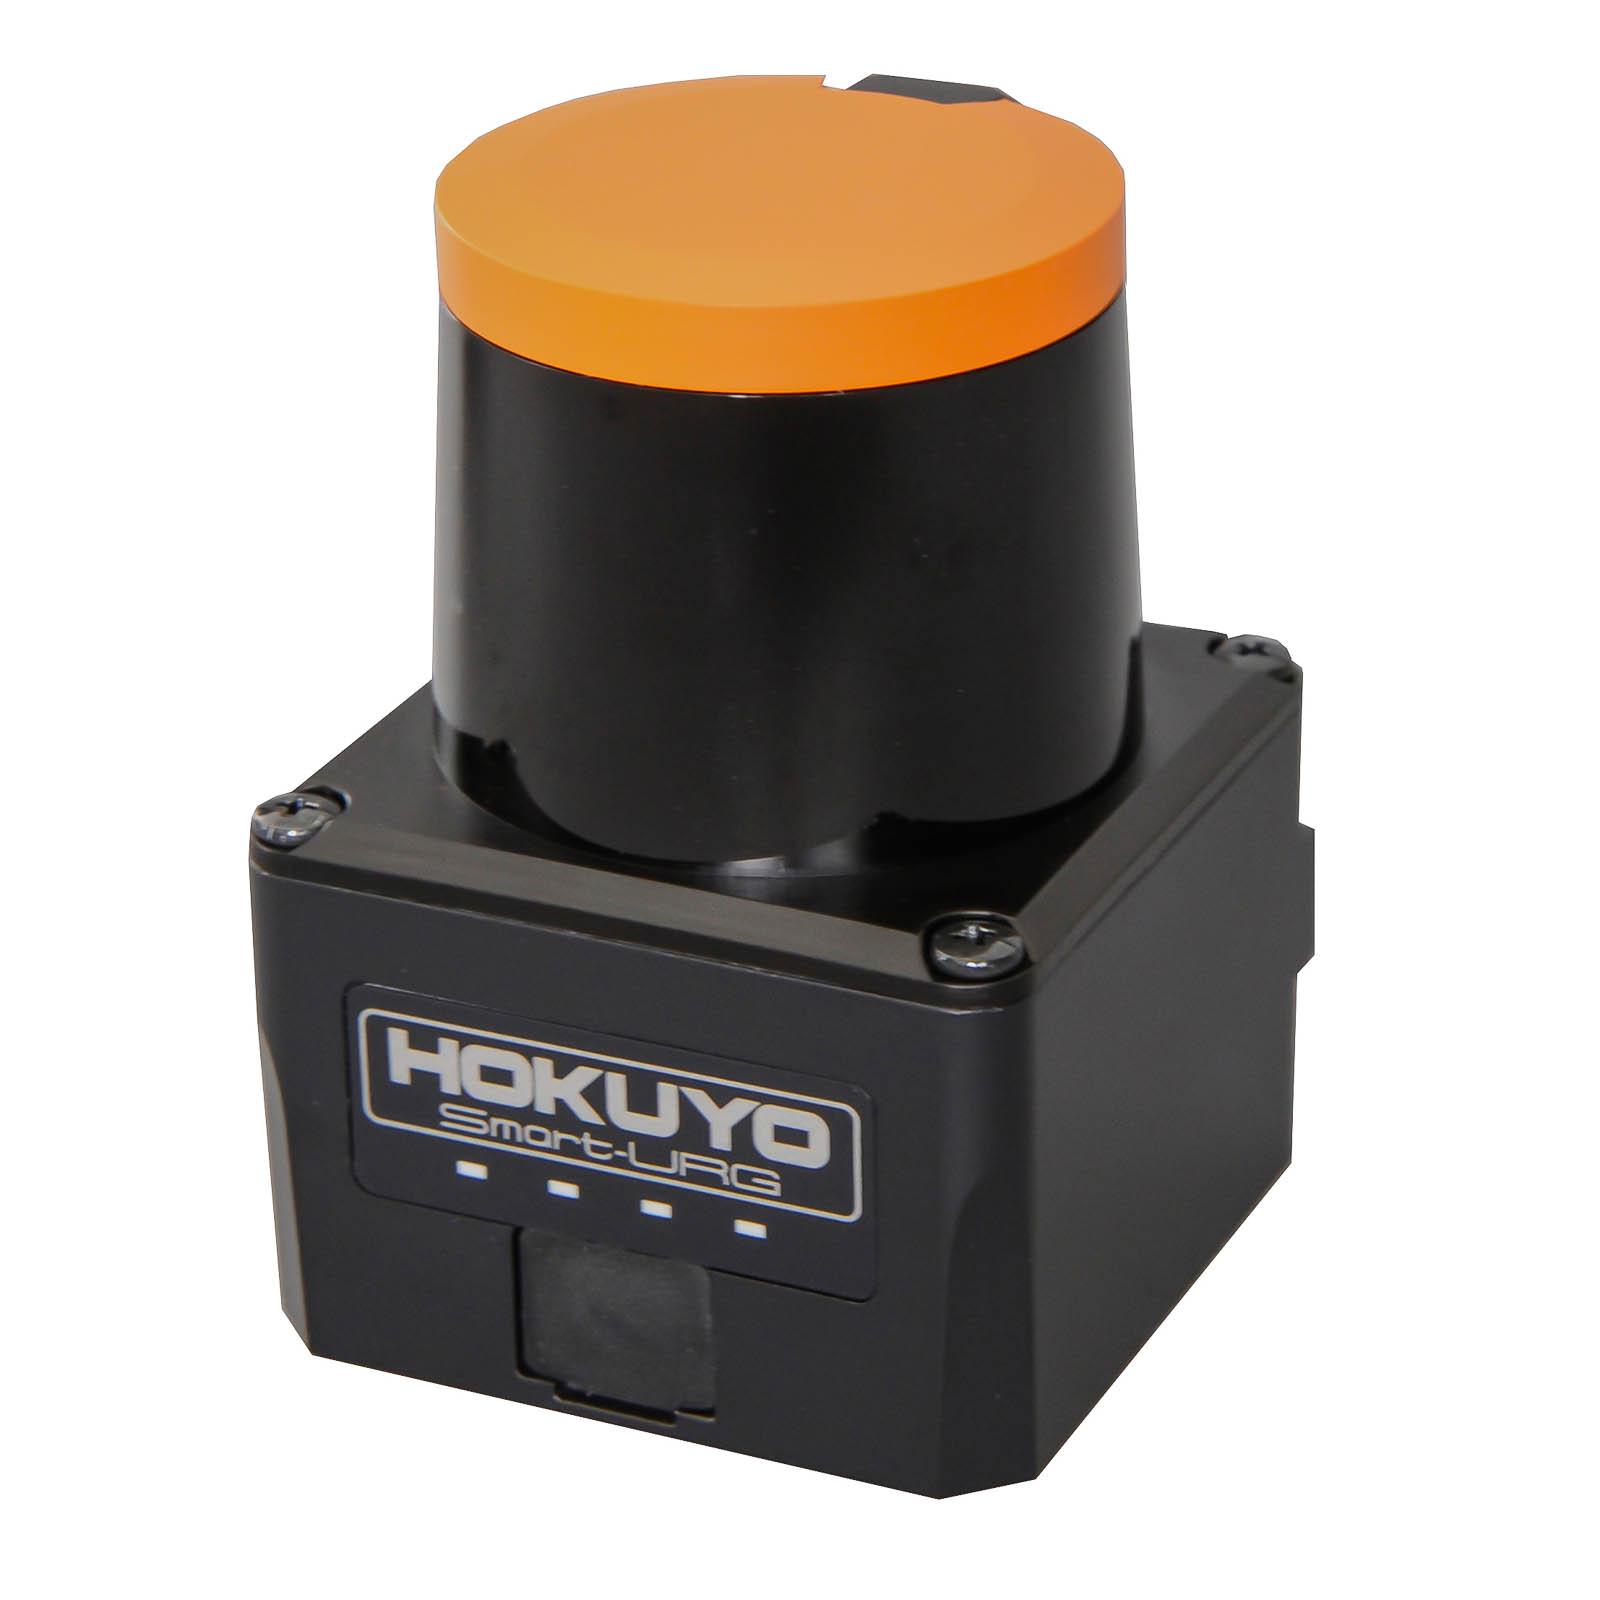 Hokuyo UST 20LX Laser Range Finder